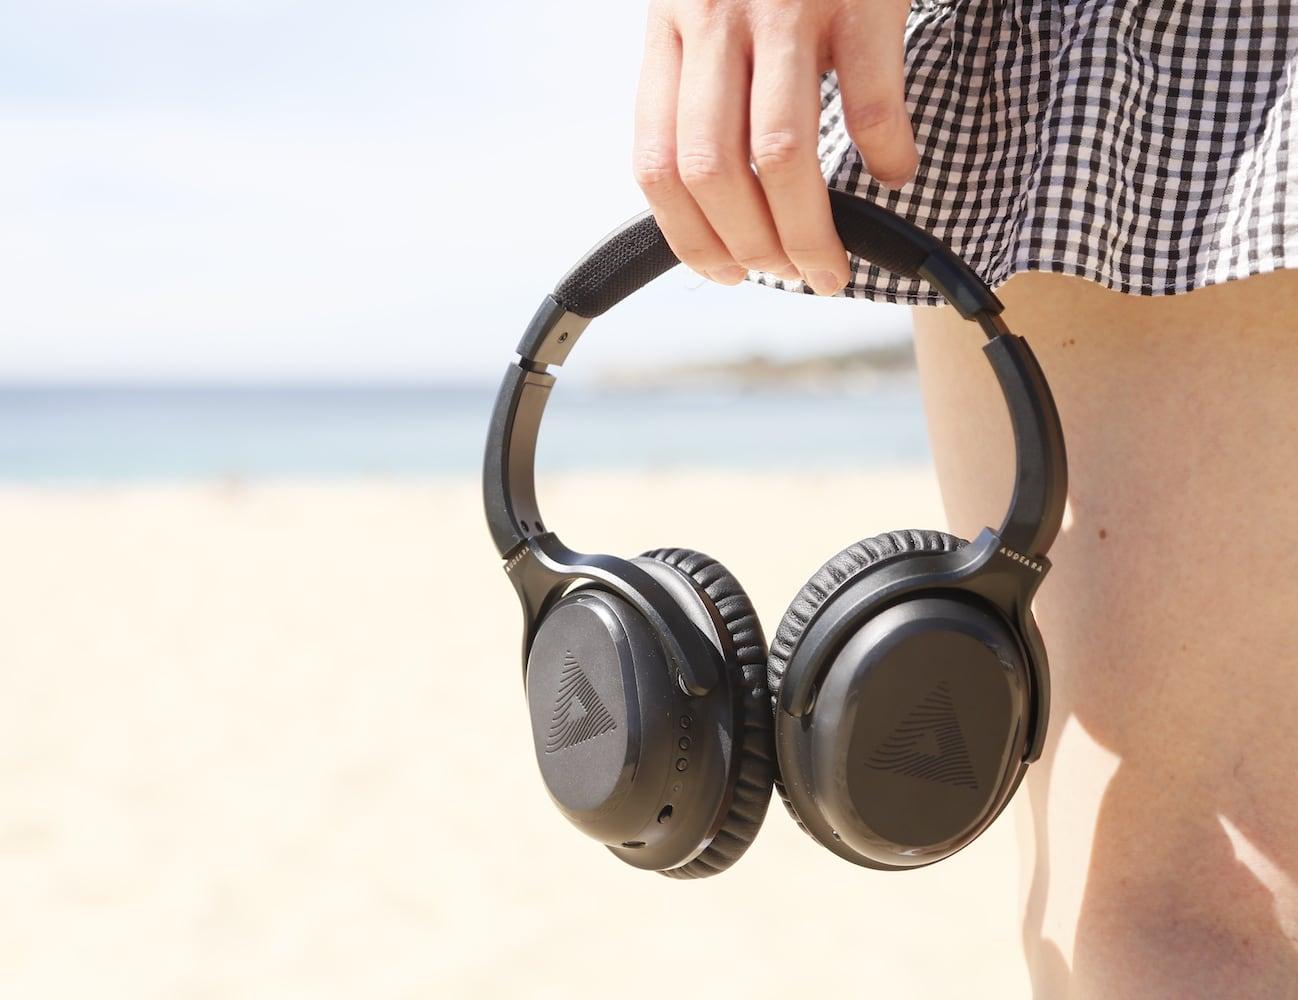 Audeara A-01 Customizable Wireless Headphones